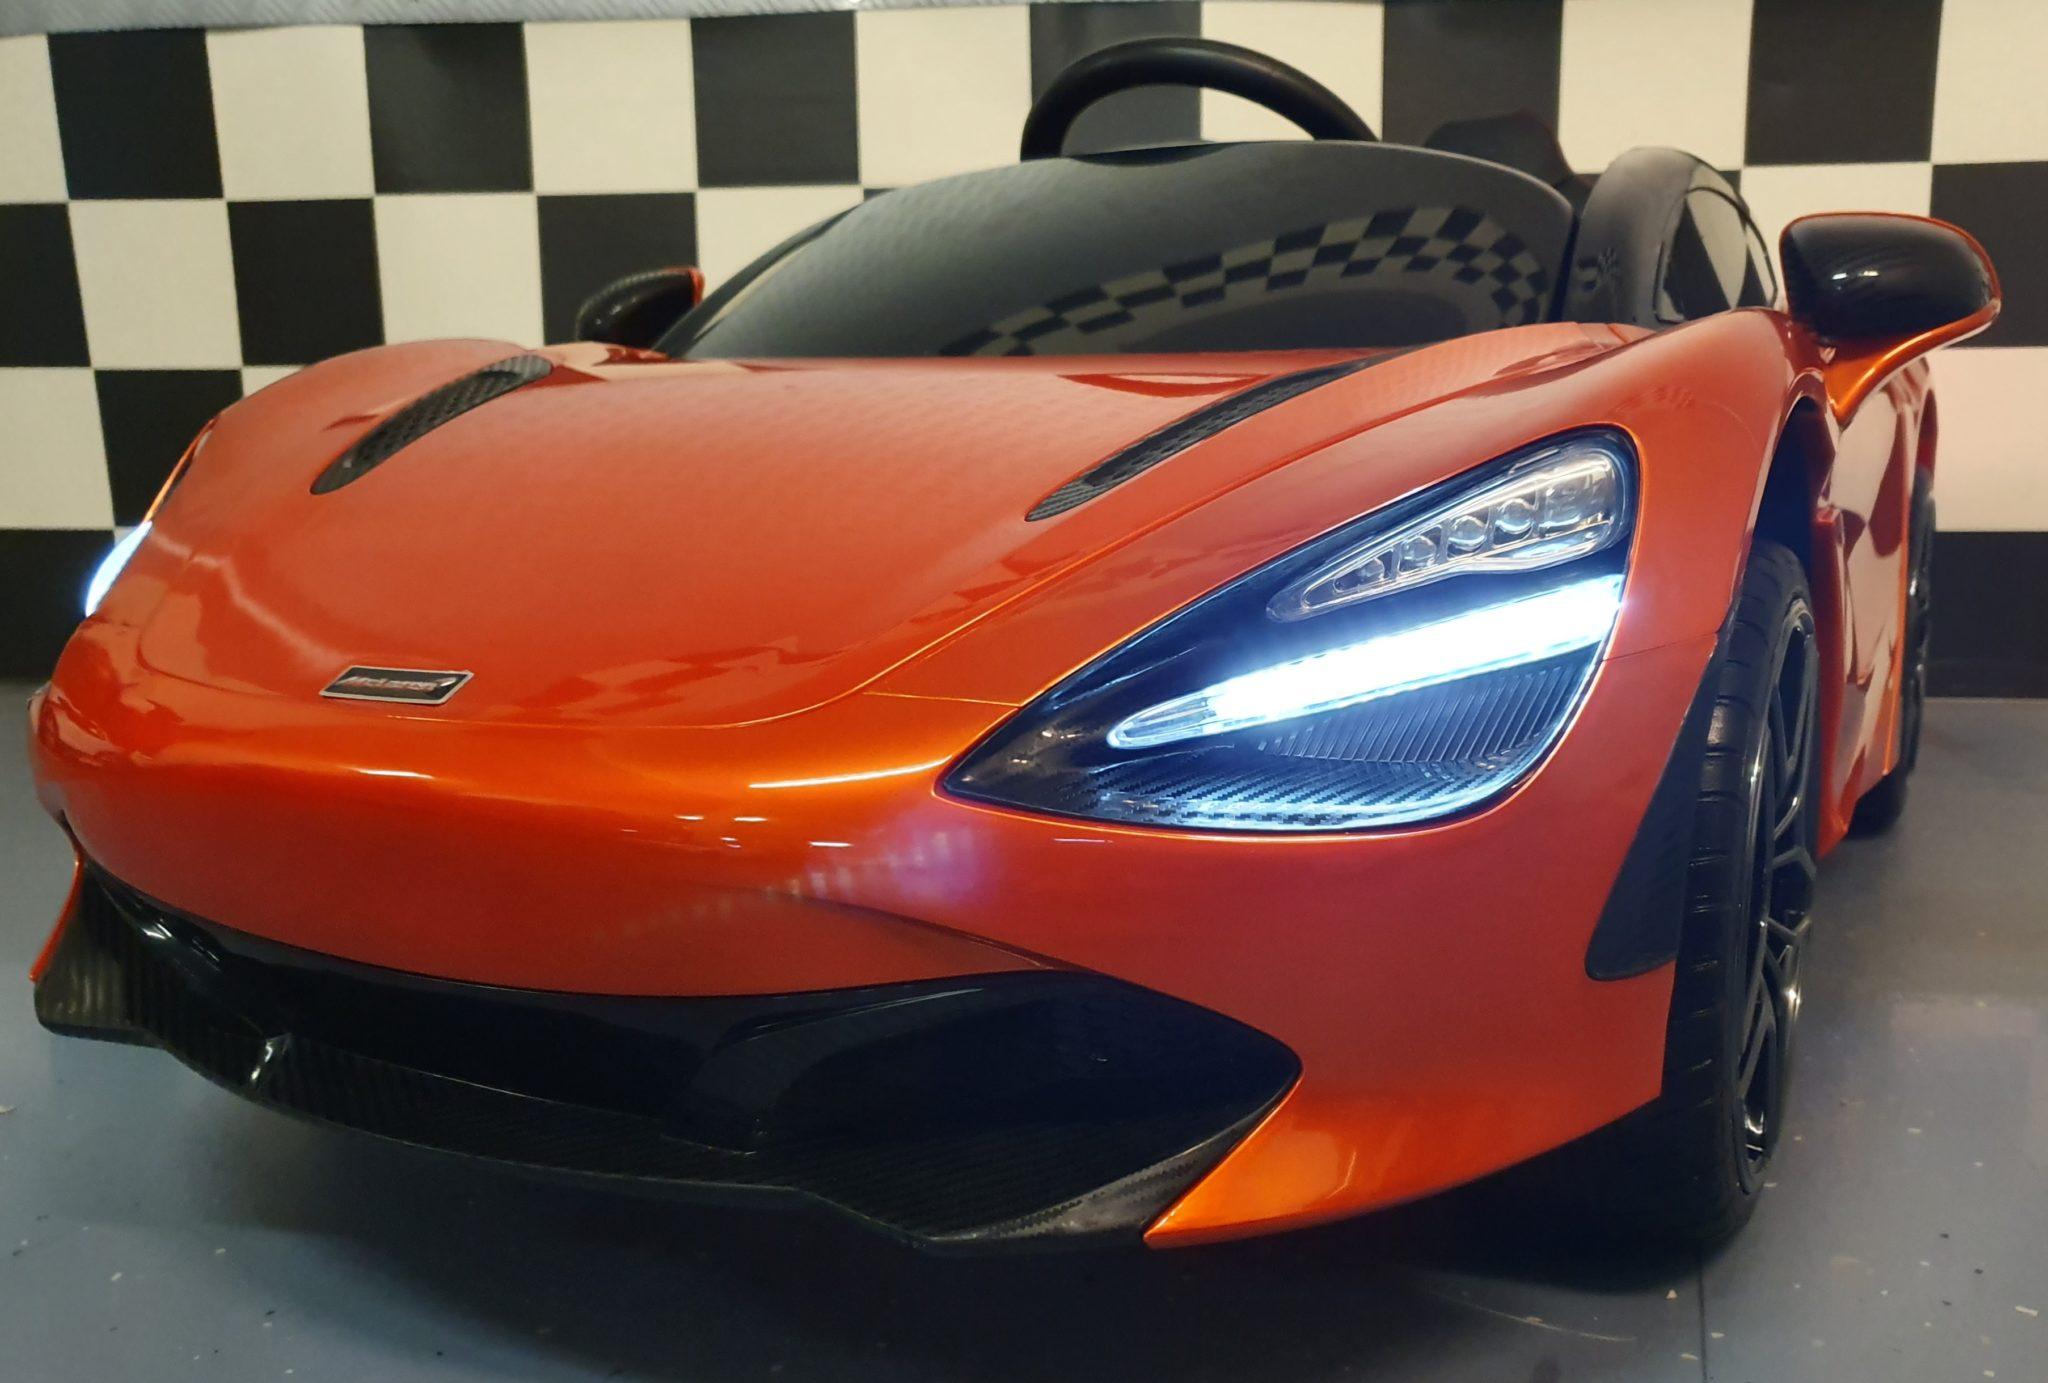 Kinder auto McLaren 720S elektrische accu auto 12V met RC Metallic Oranje